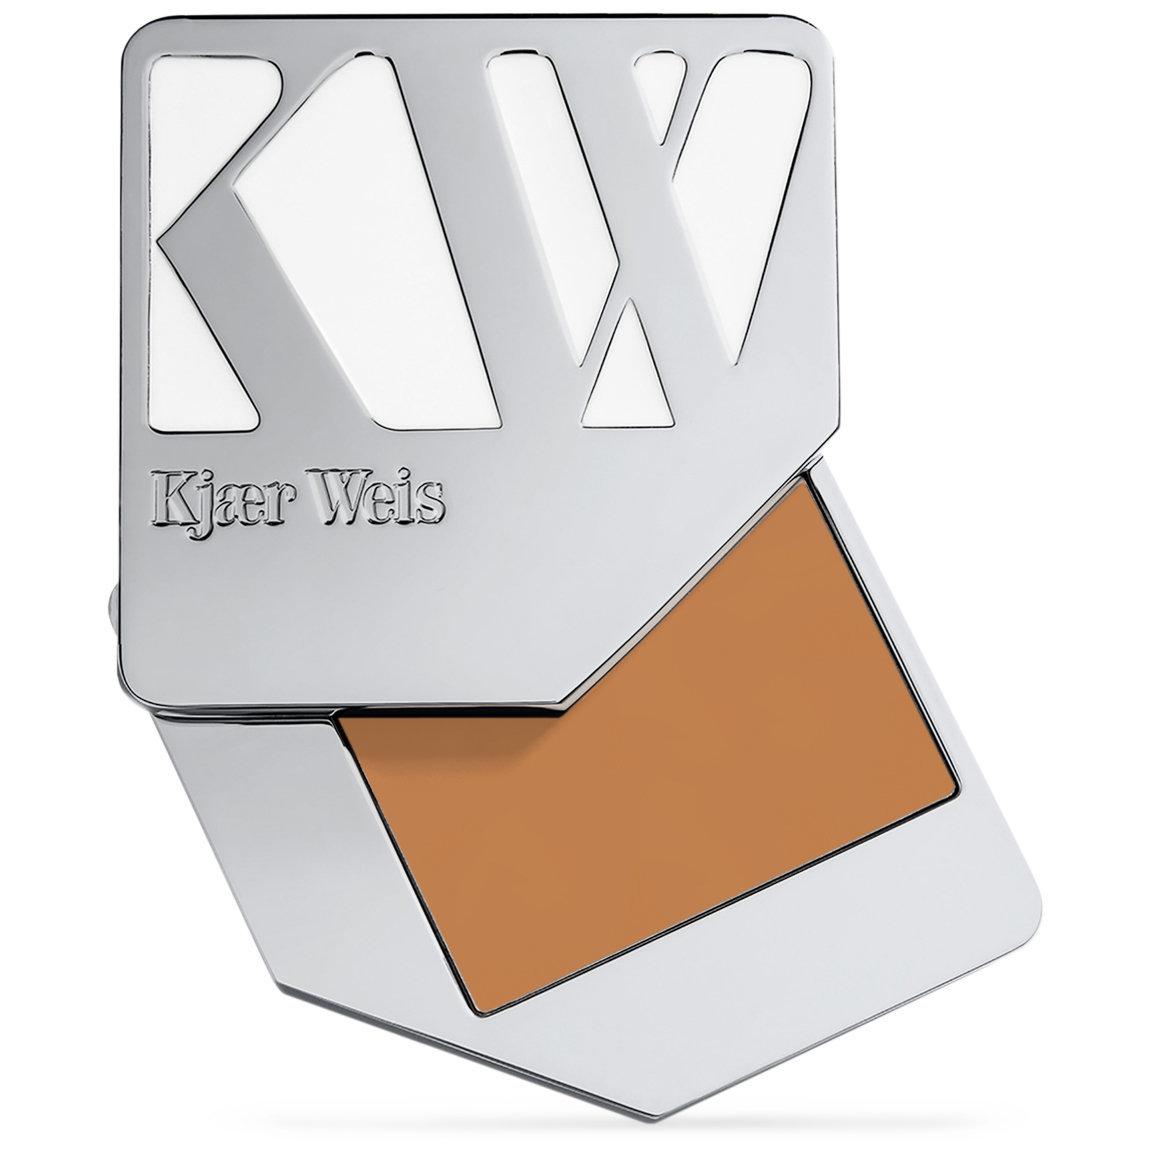 Kjaer Weis Cream Foundation Dainty alternative view 1.